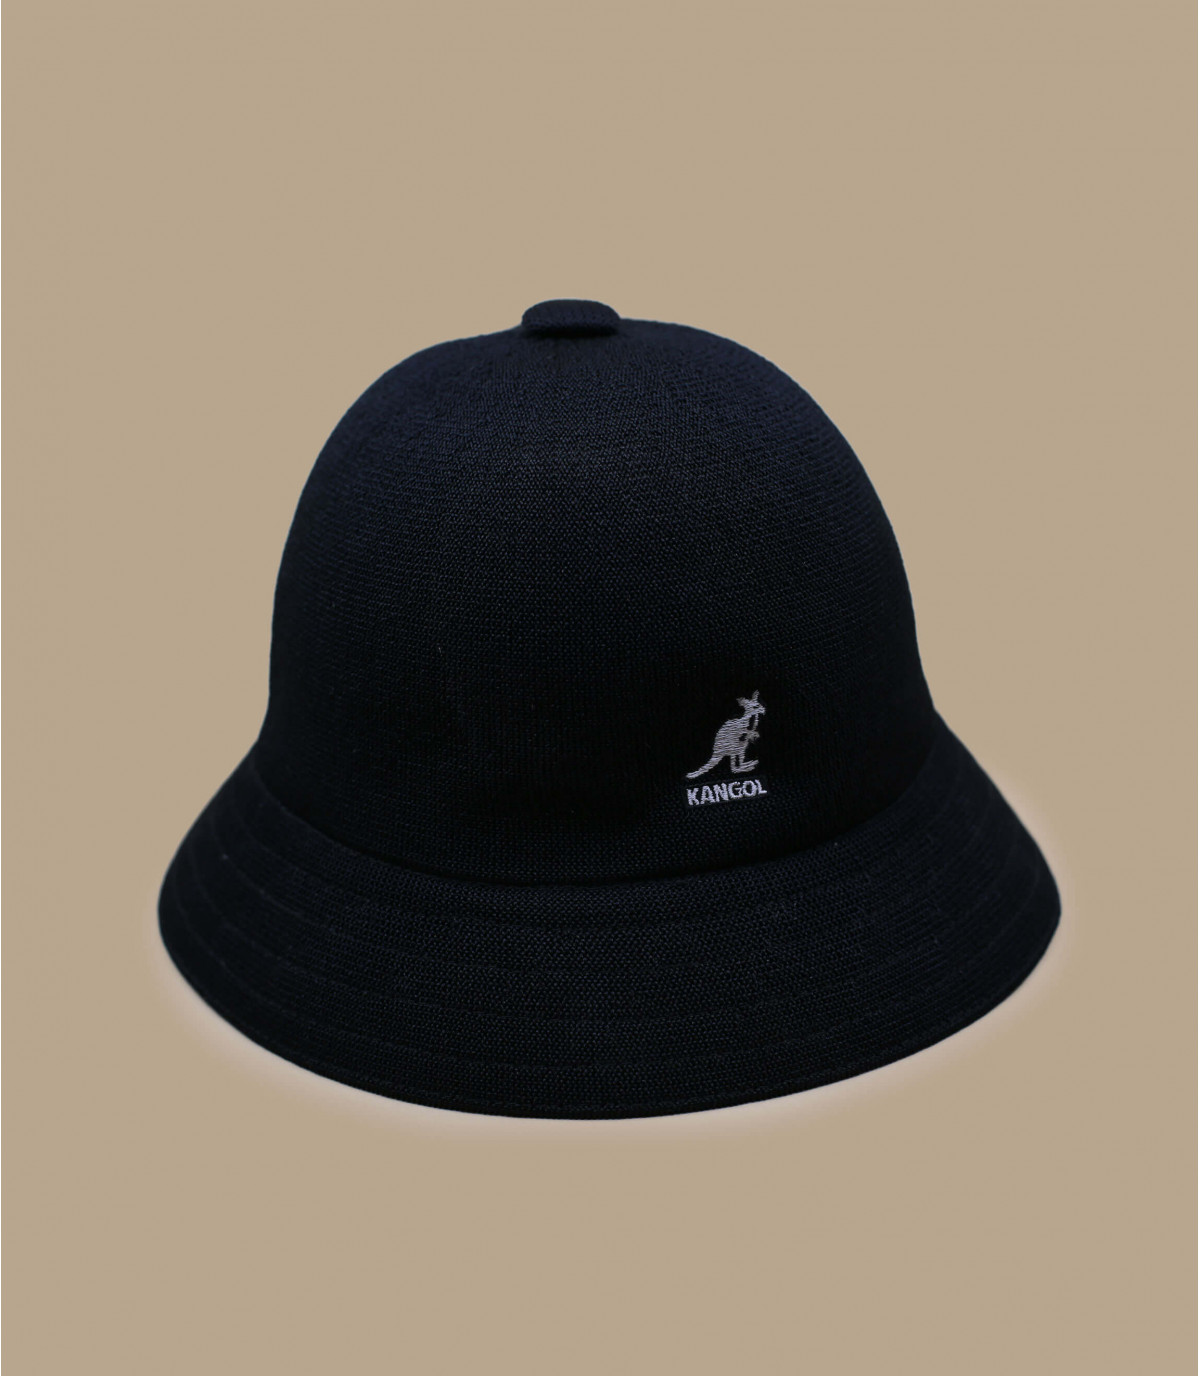 Bob Kangol tropic negro